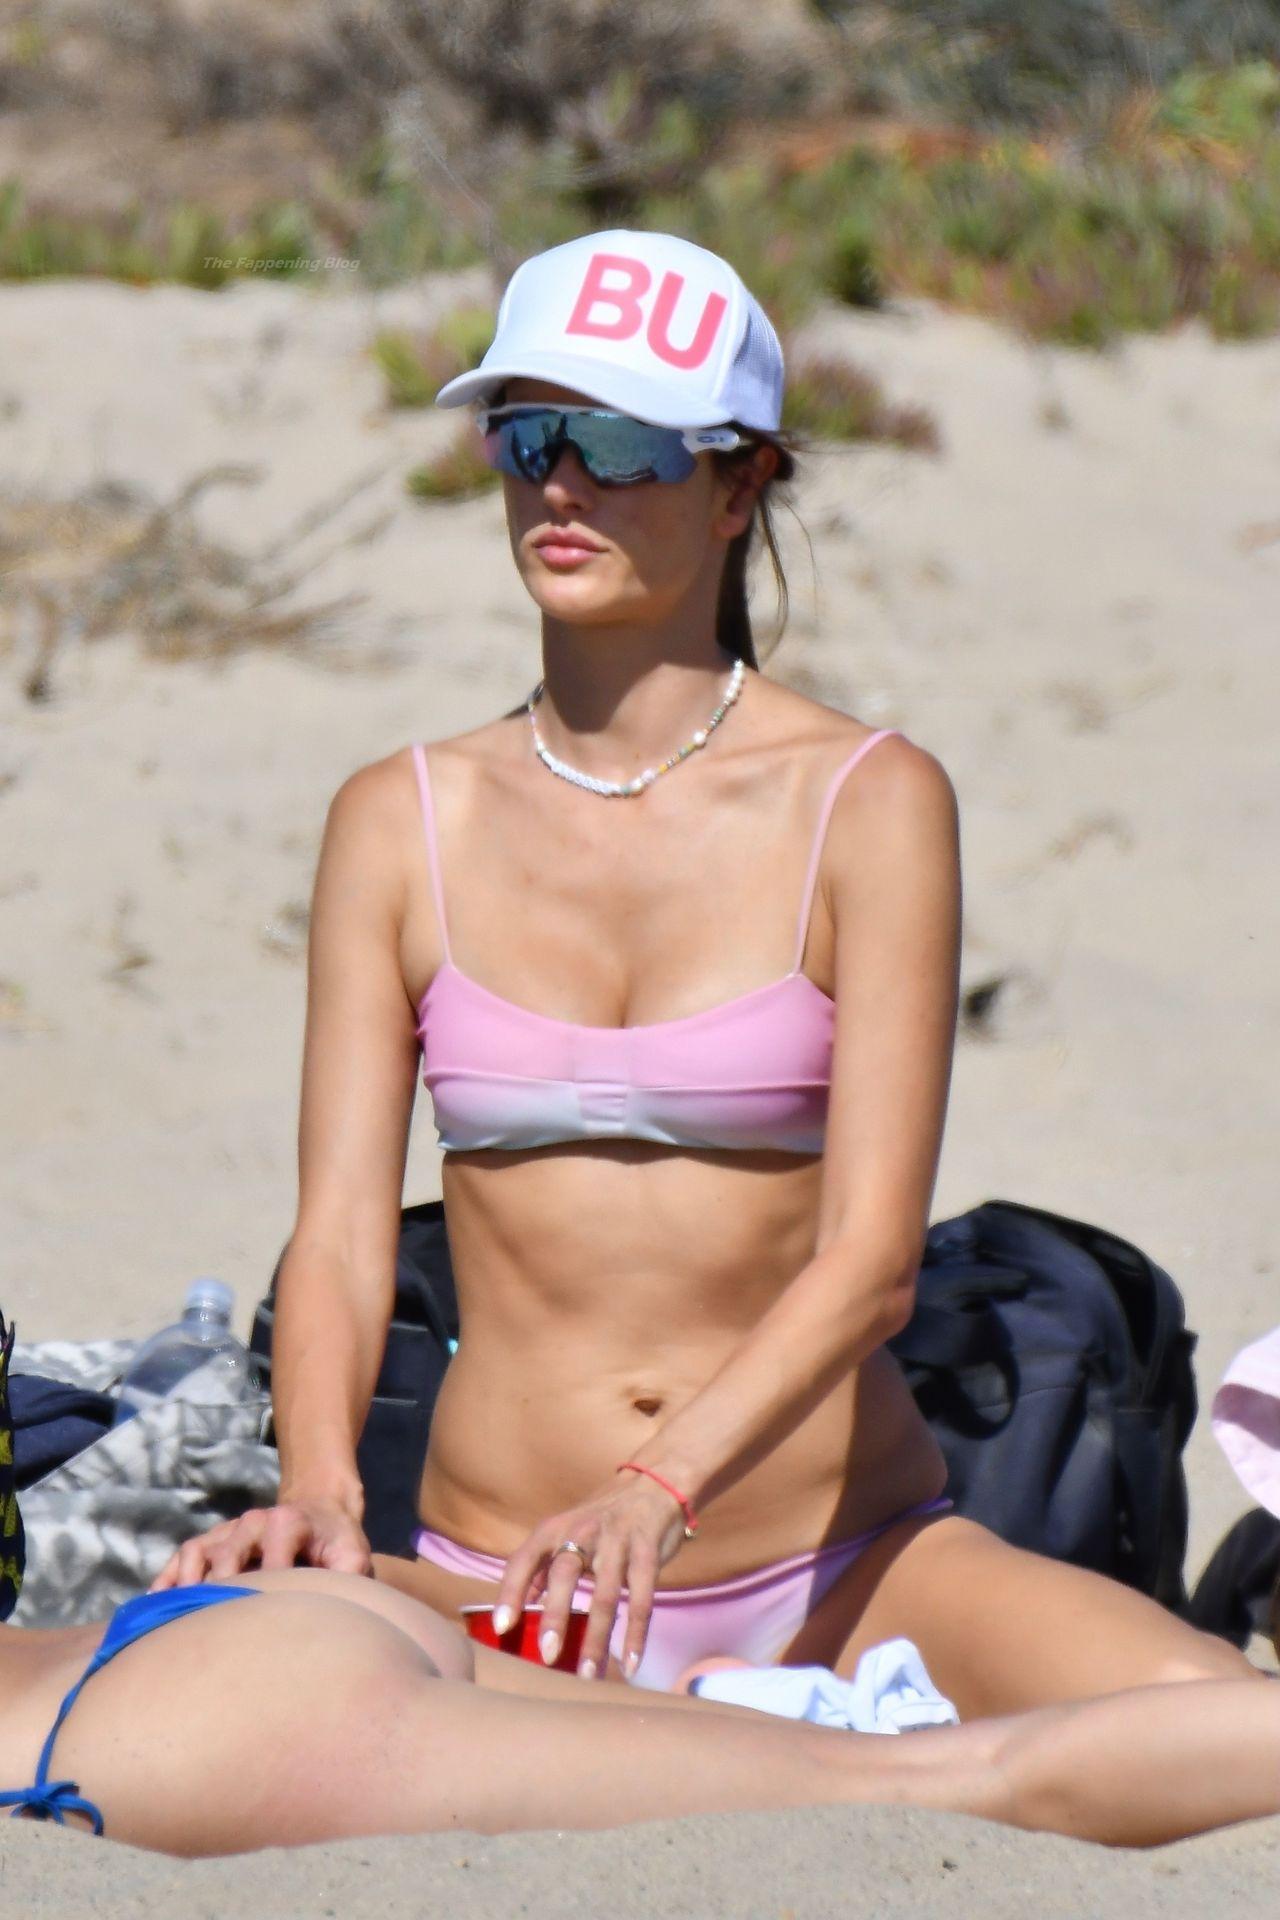 Alessandra-Ambrosio-Sexy-The-Fappening-Blog-66.jpg